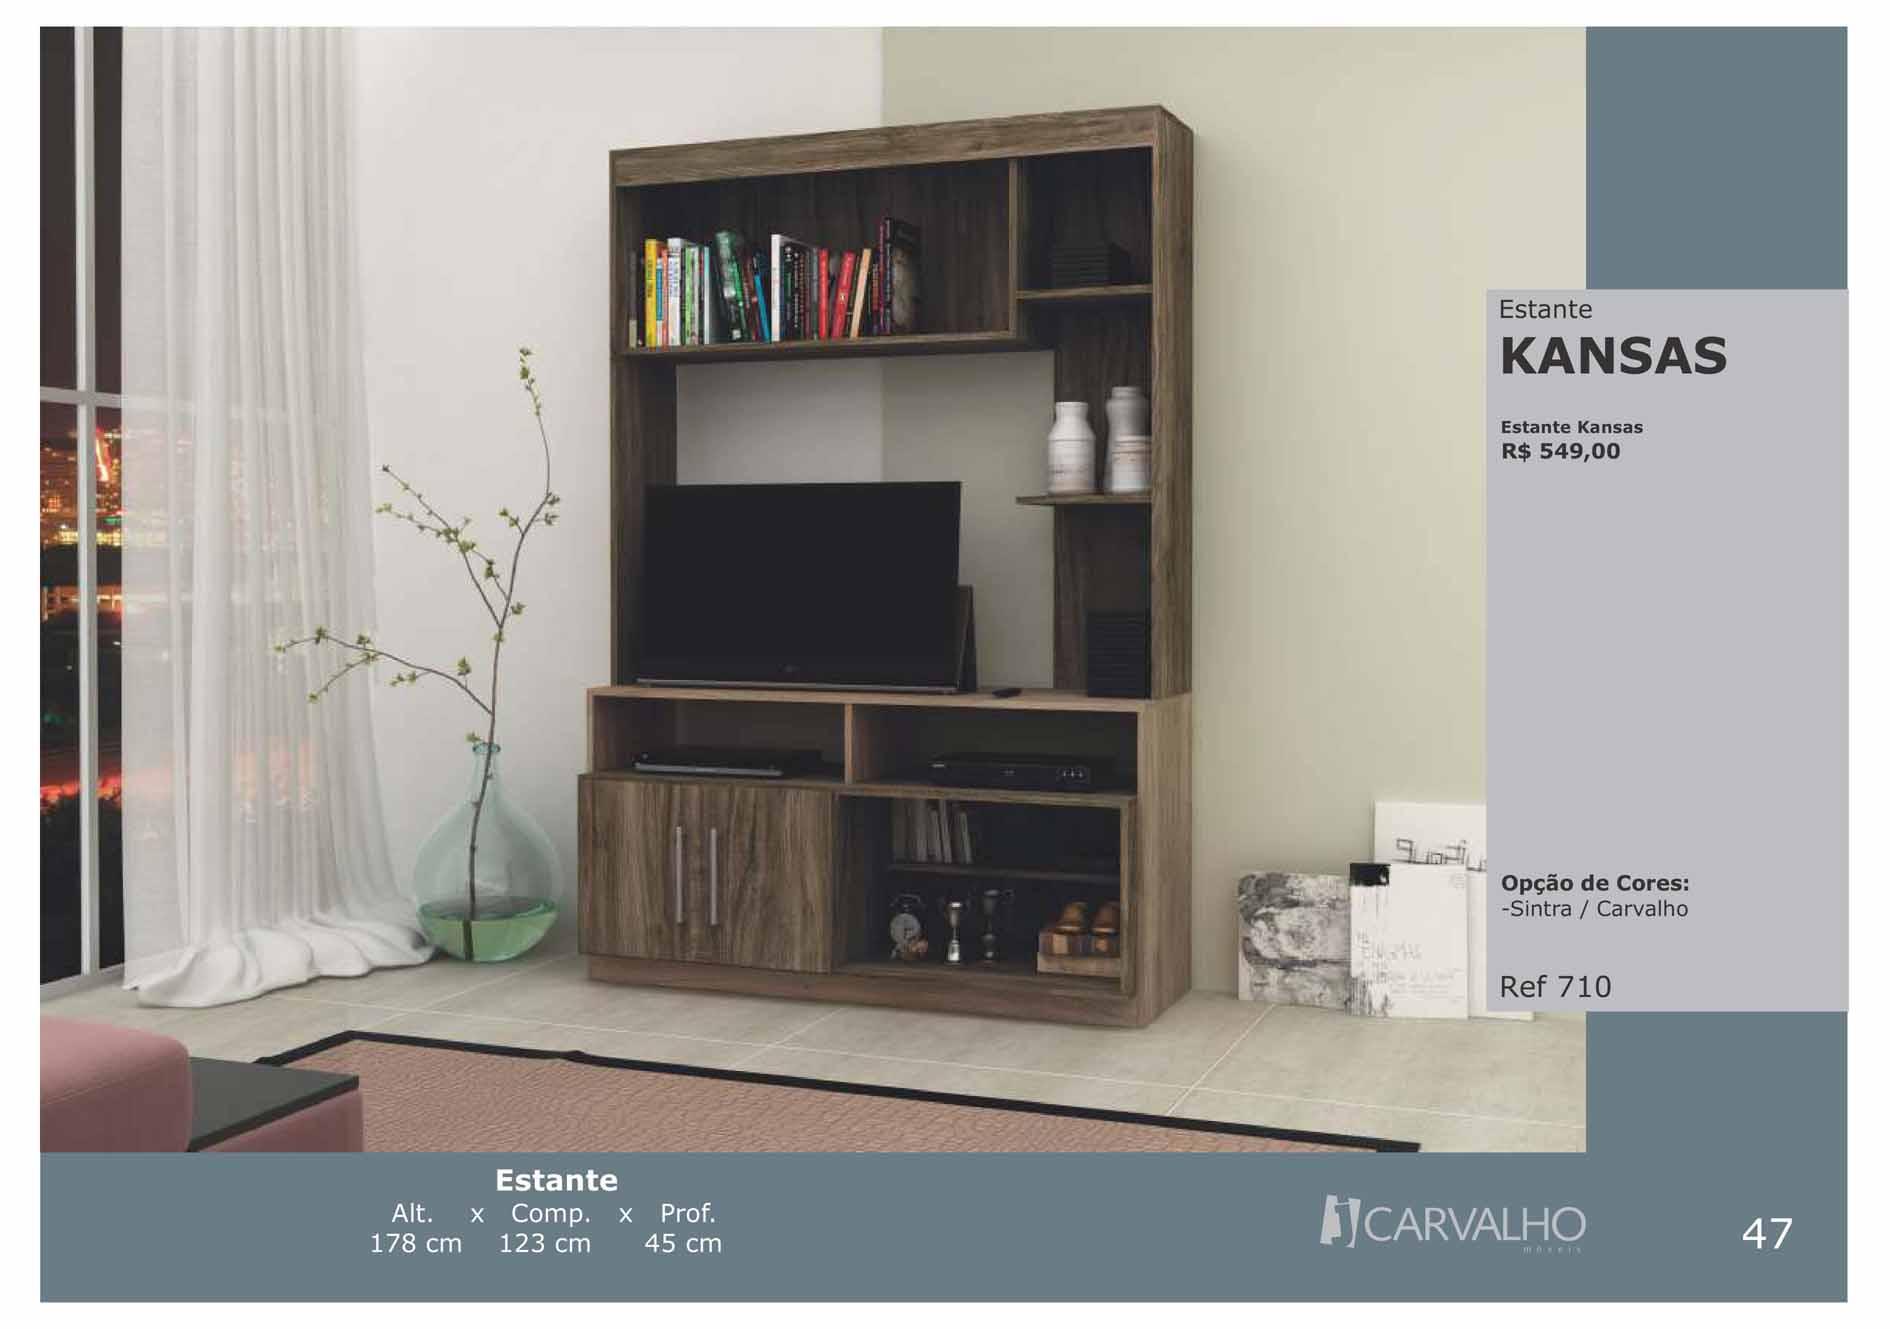 Kansas – Ref 710